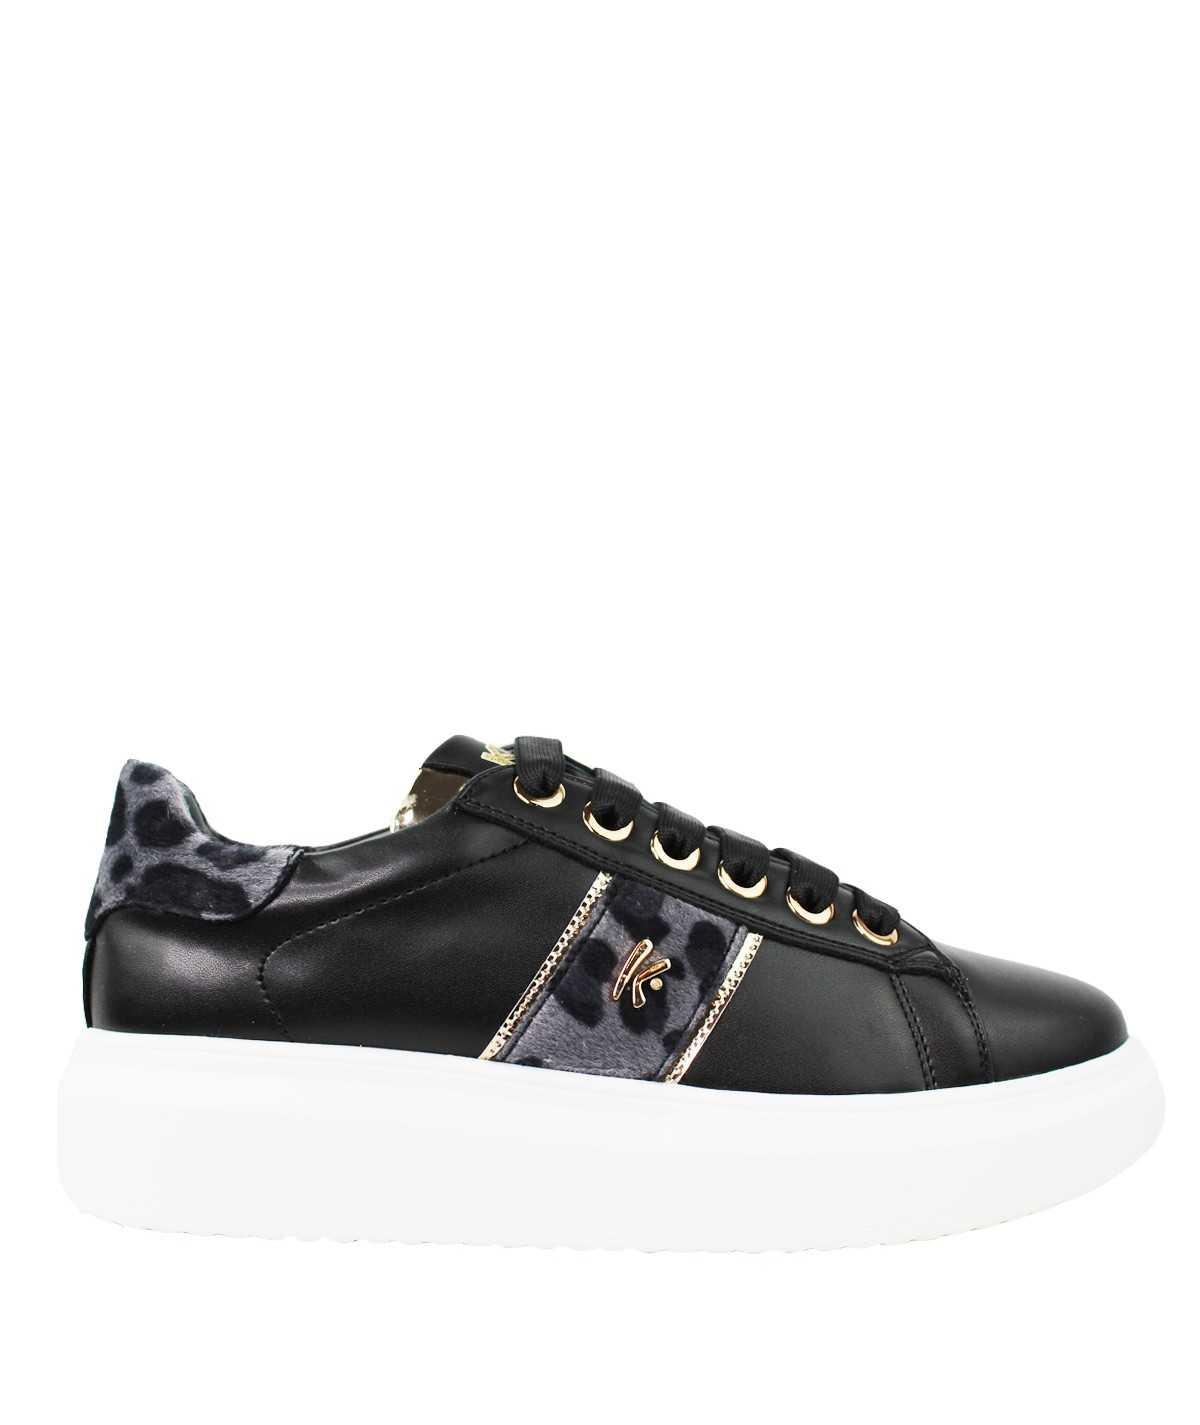 KEYS Sneakers Donna